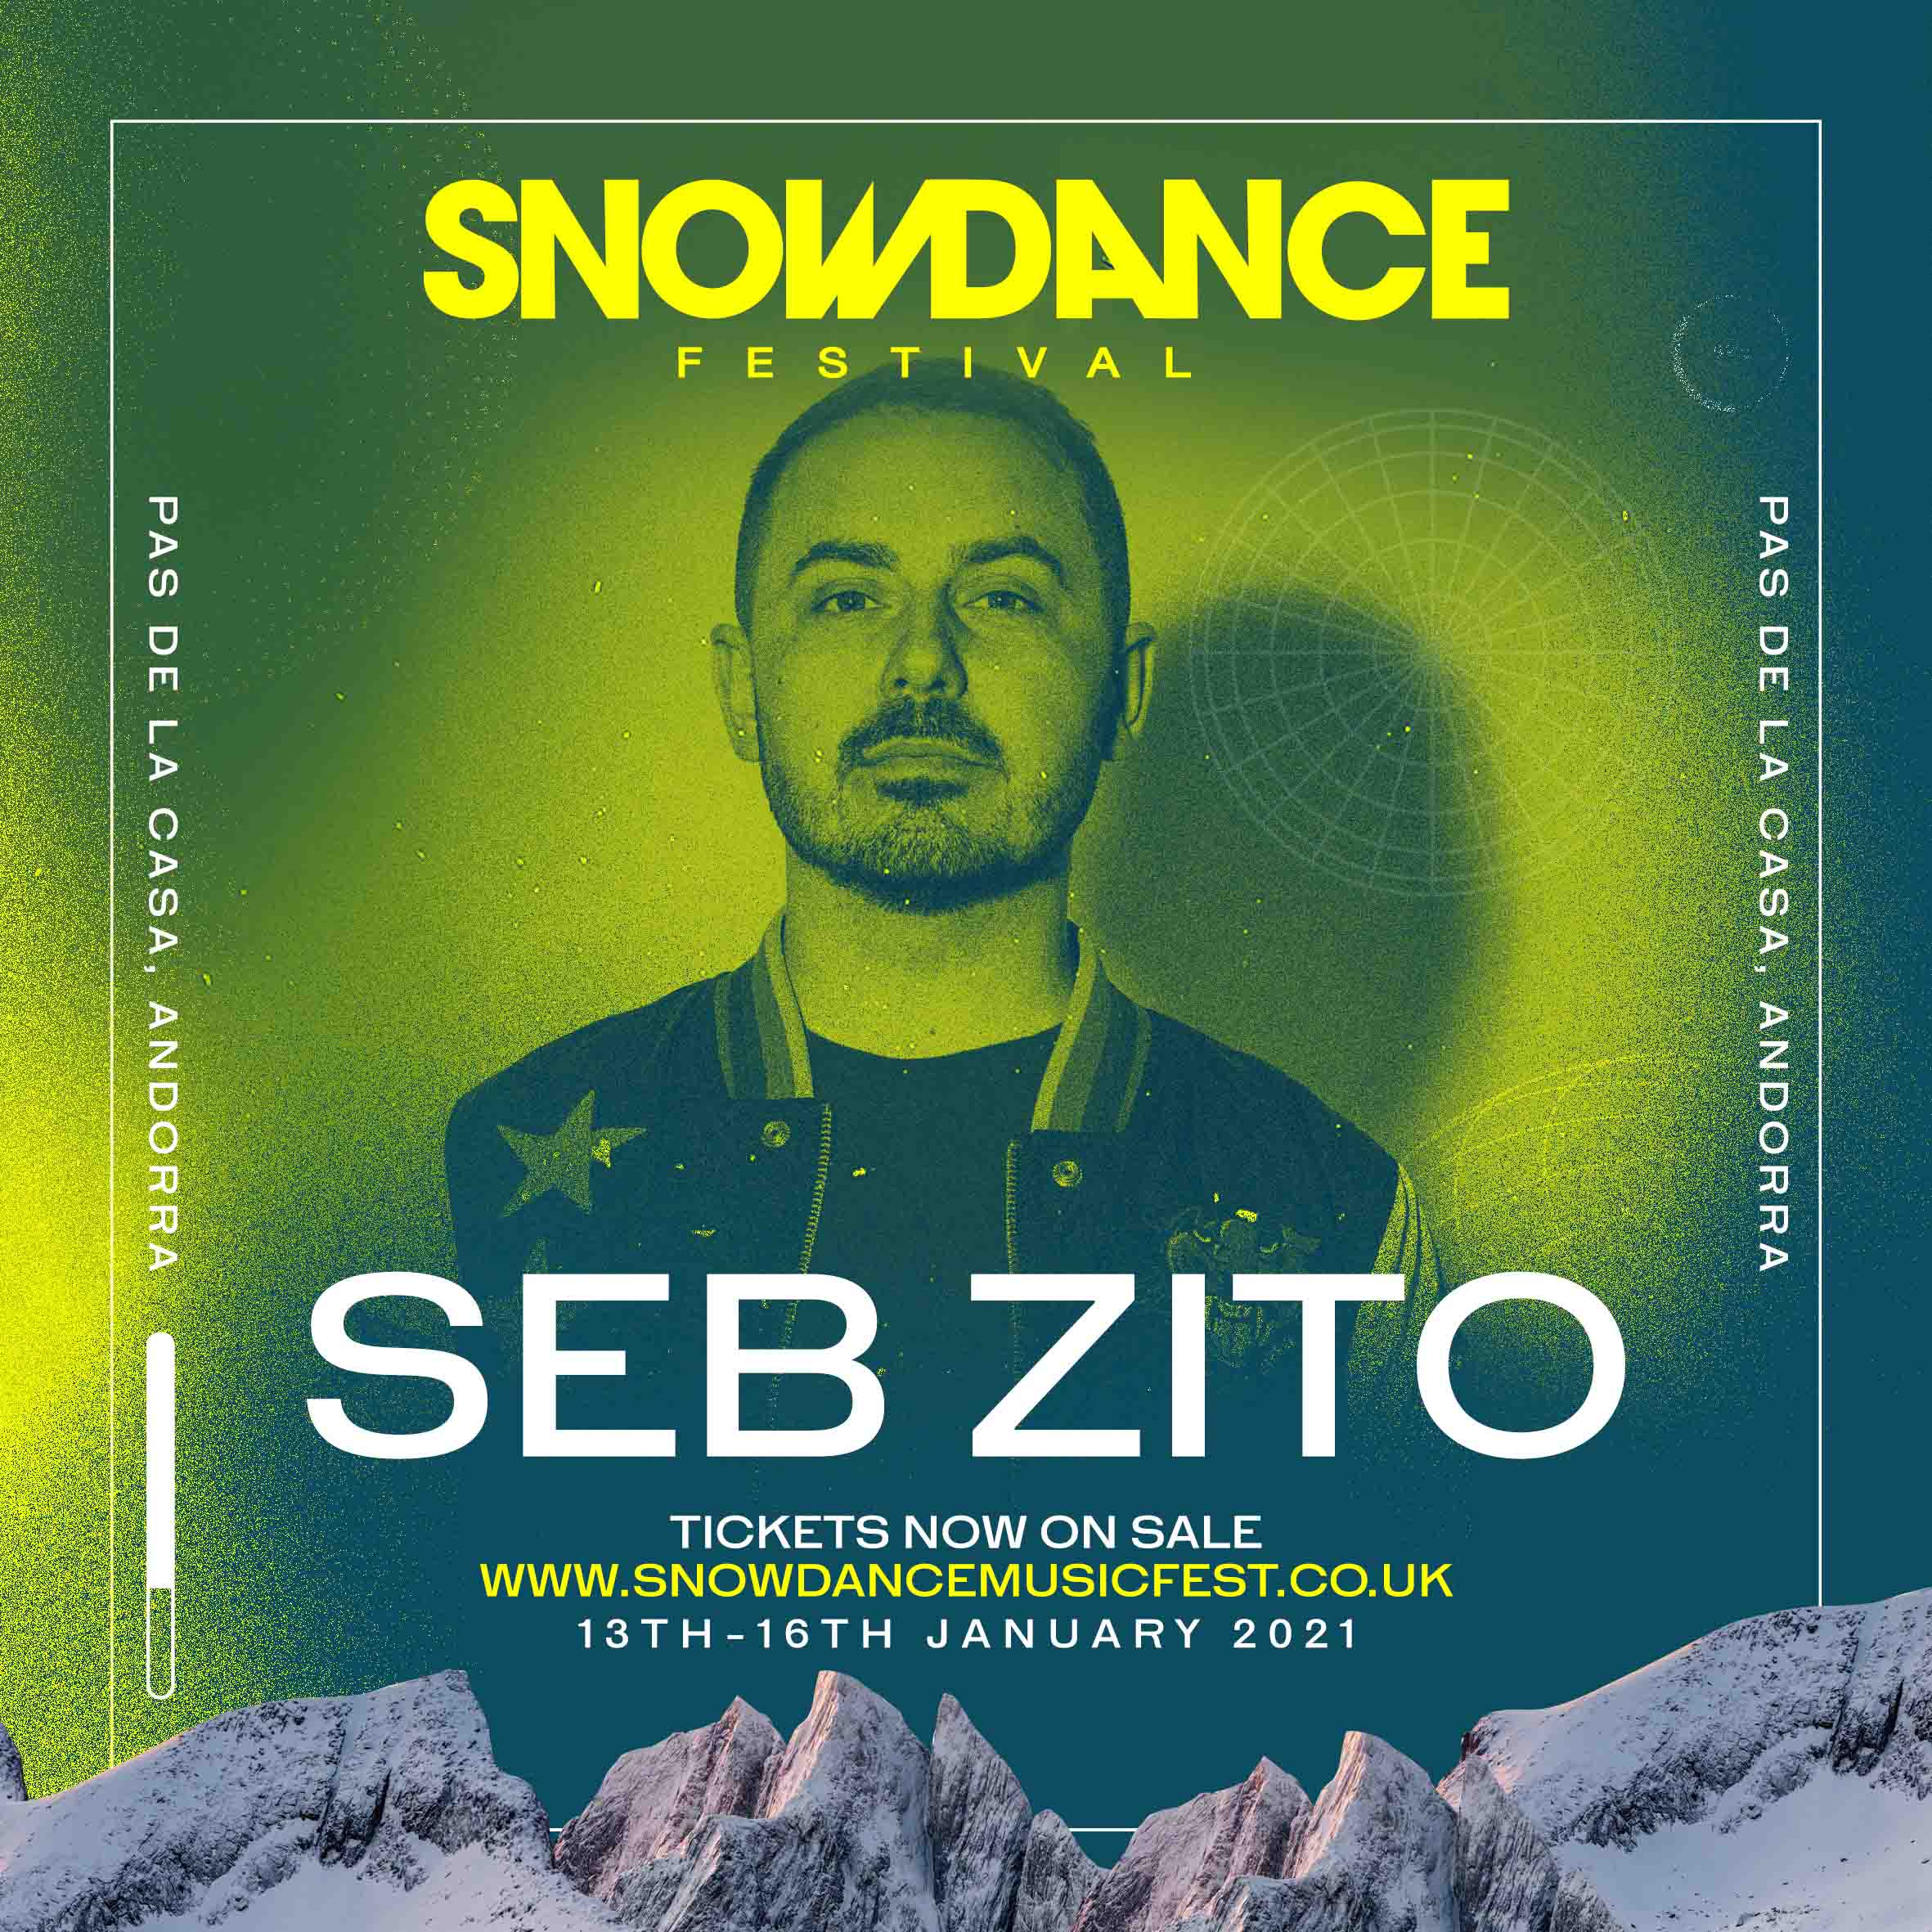 SnowDance festival seb zito